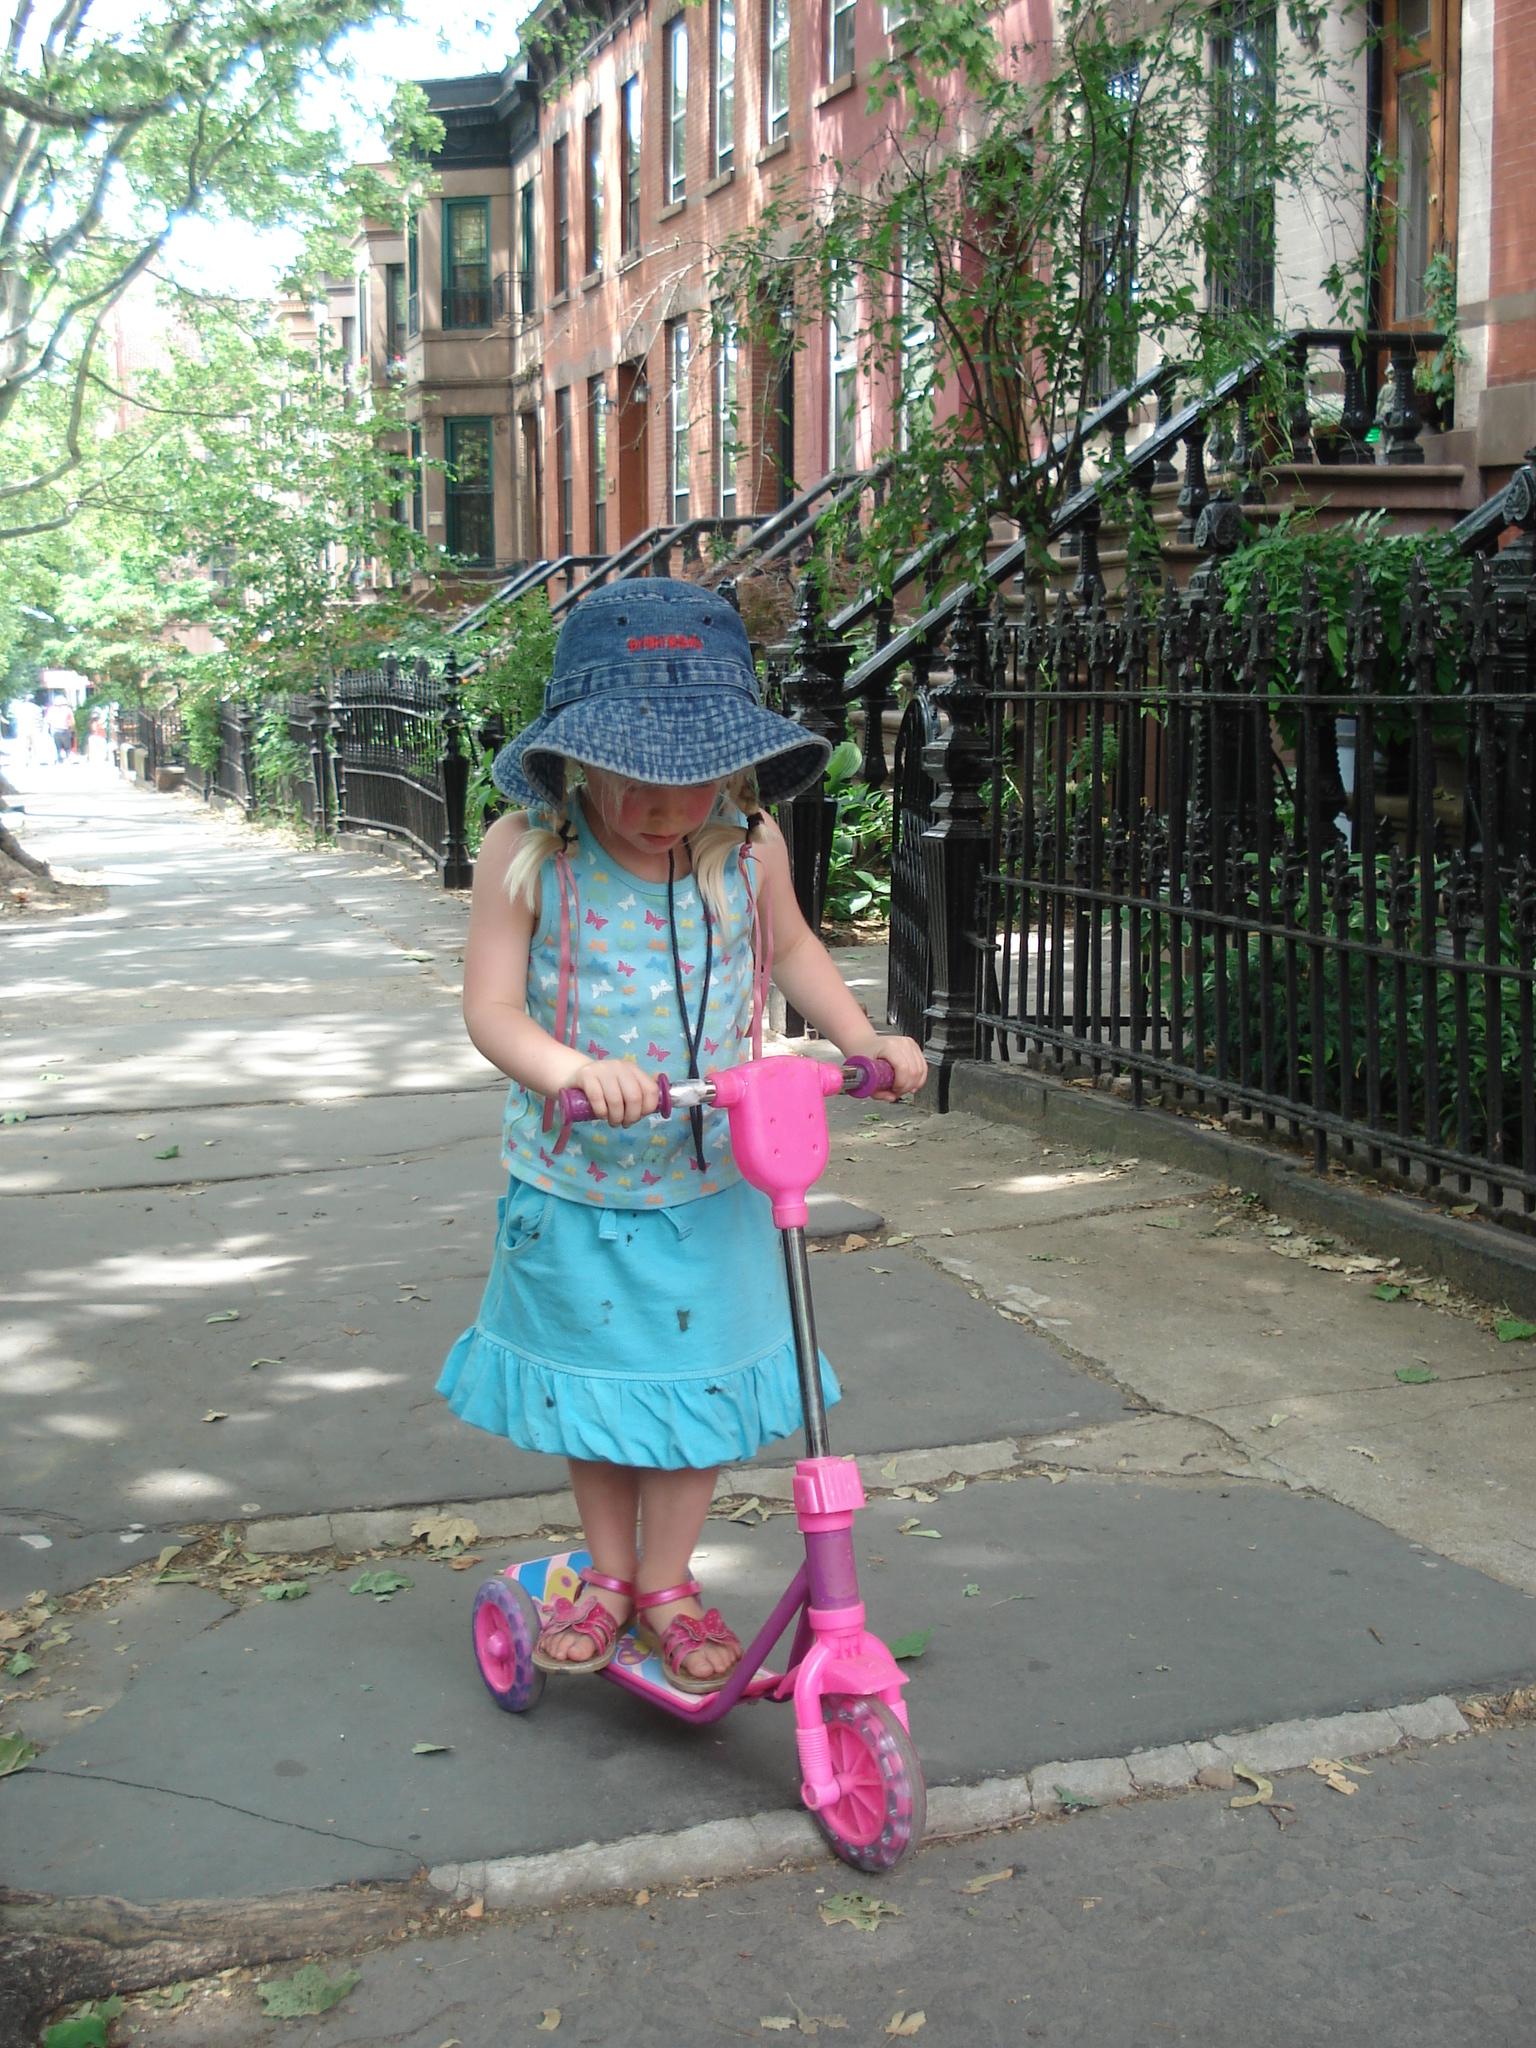 file little girl on scooter 4699130259 5751c2995e